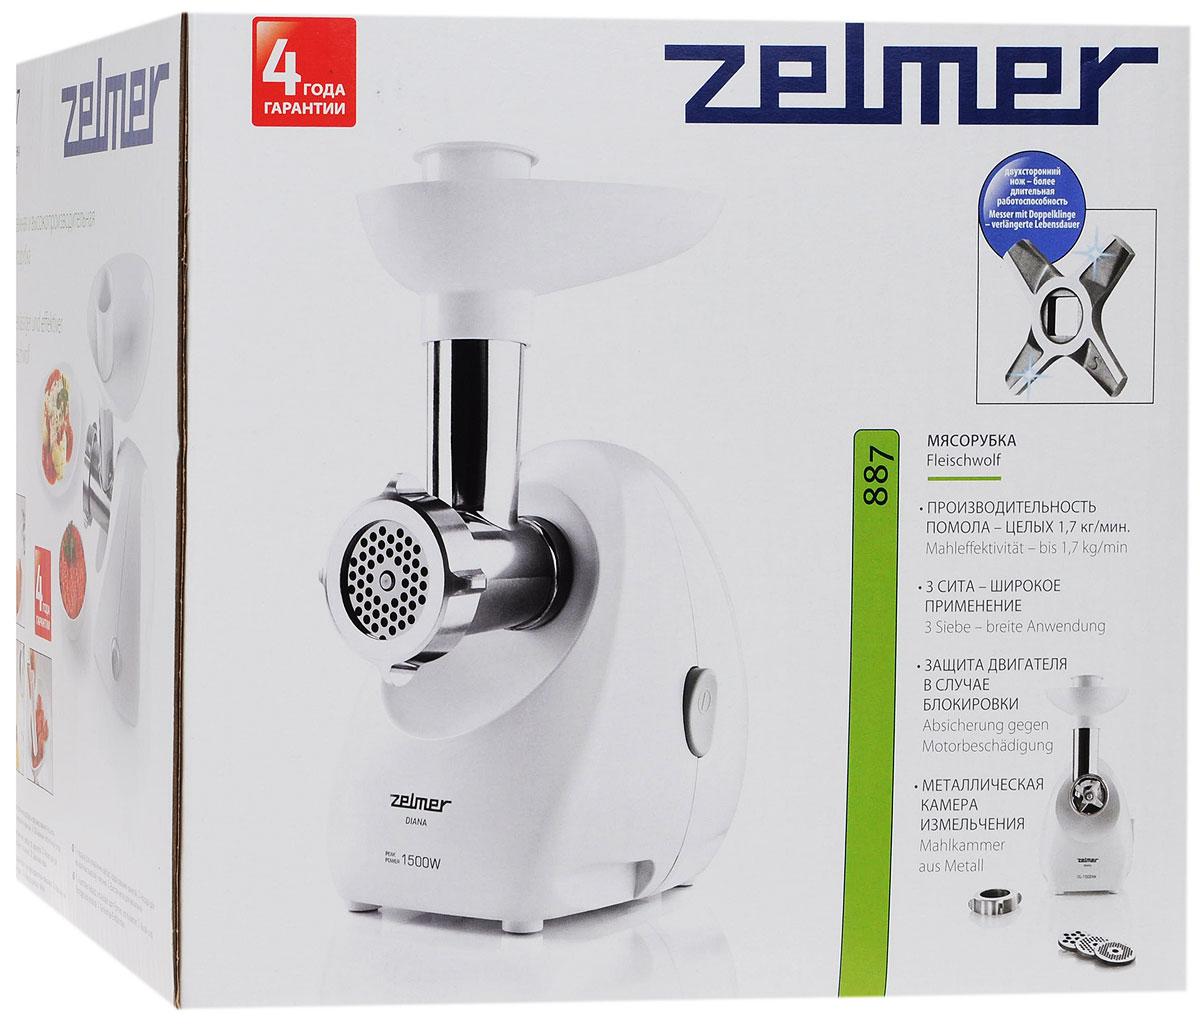 Zelmer ZMM 1006SRU, White мясорубка